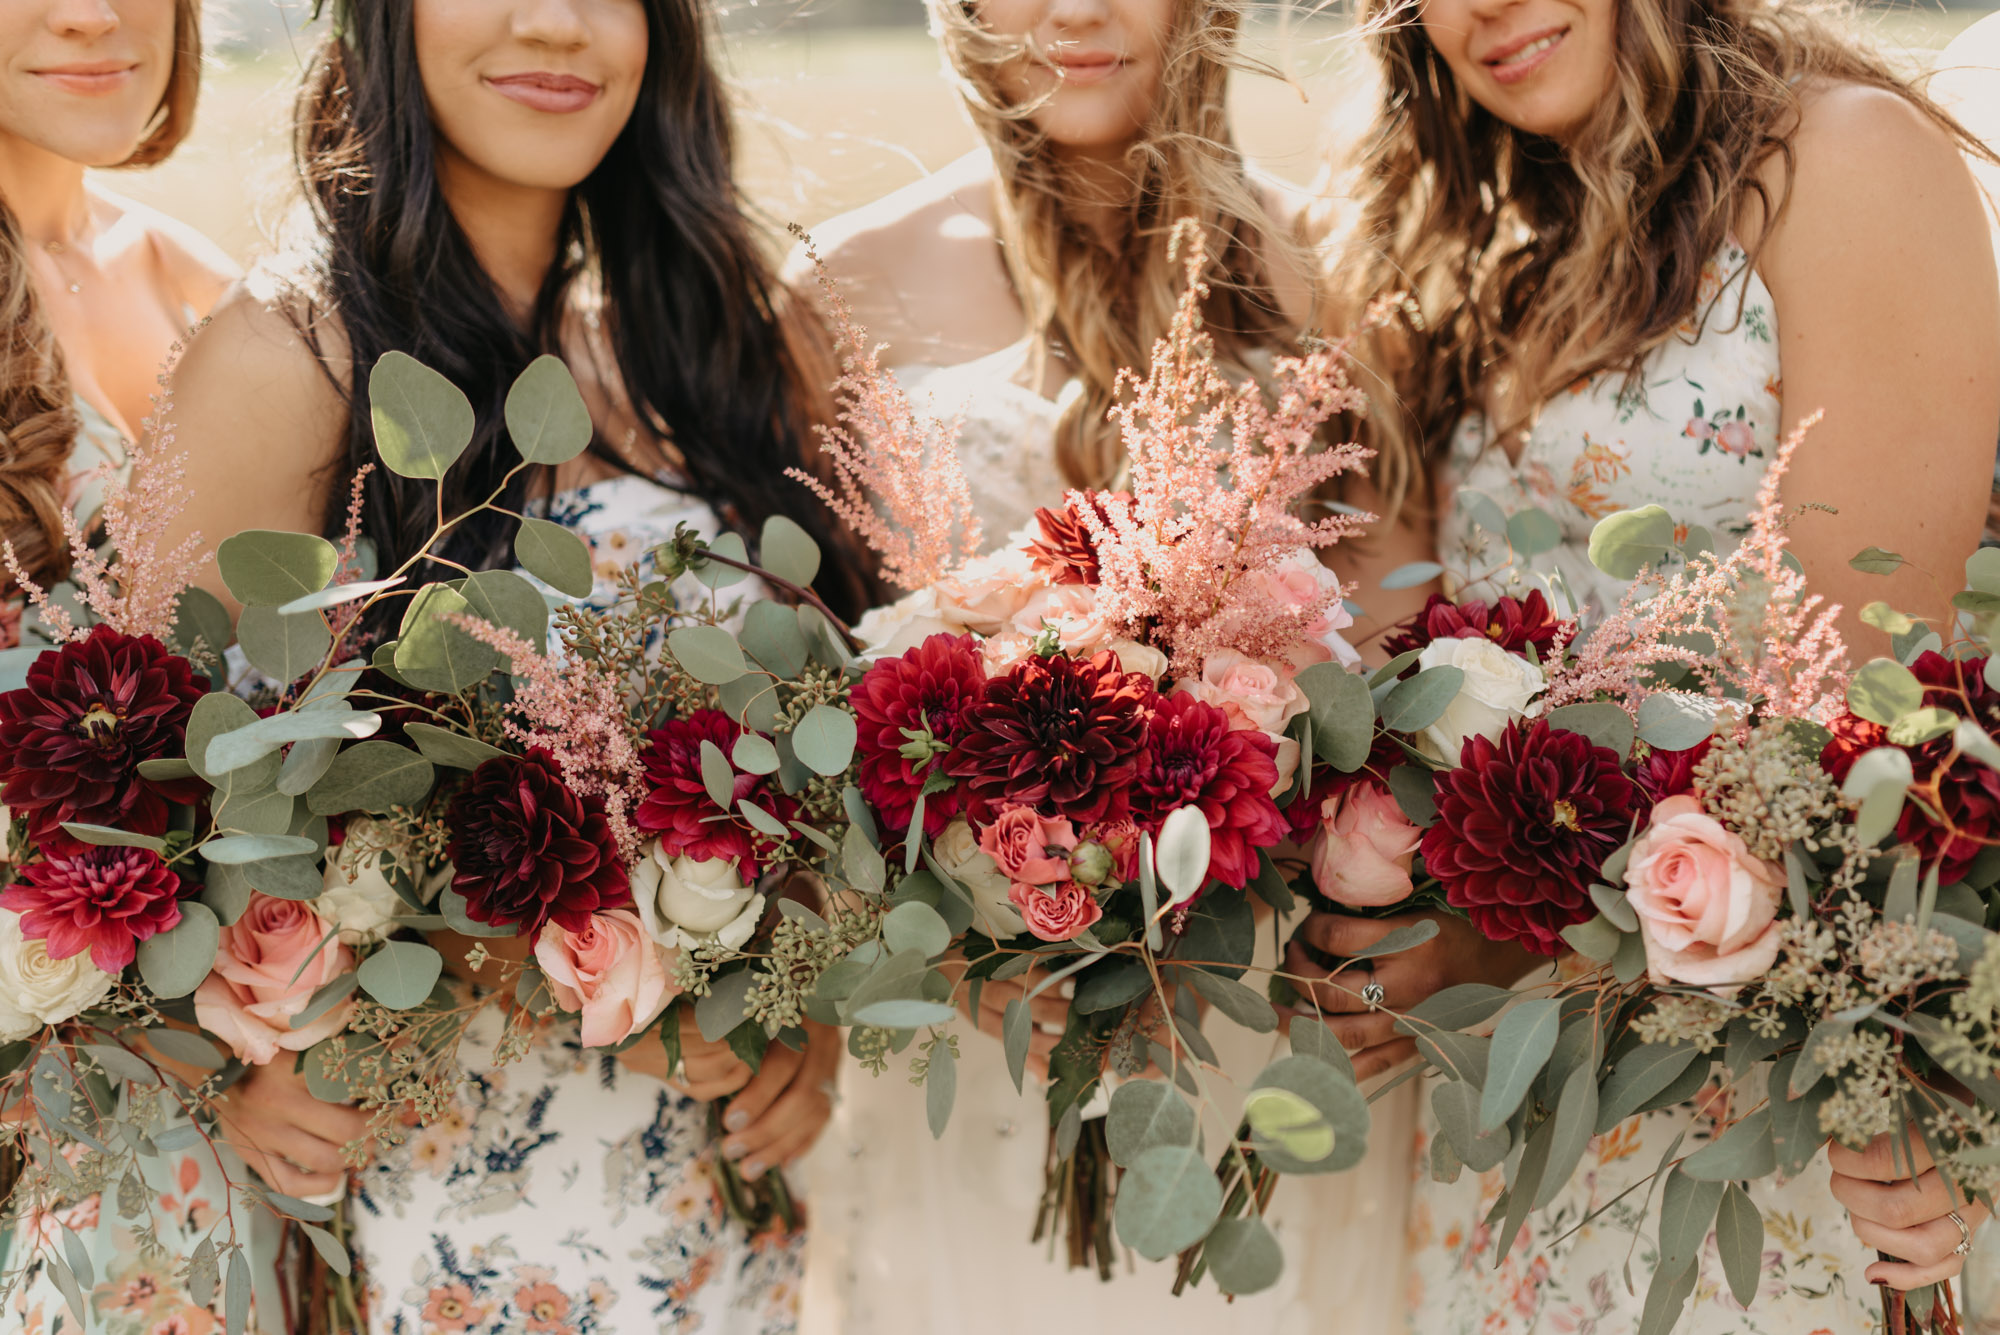 Bridal-Party-Free-People-Flower-Dresses-Washington-Wedding-8498.jpg